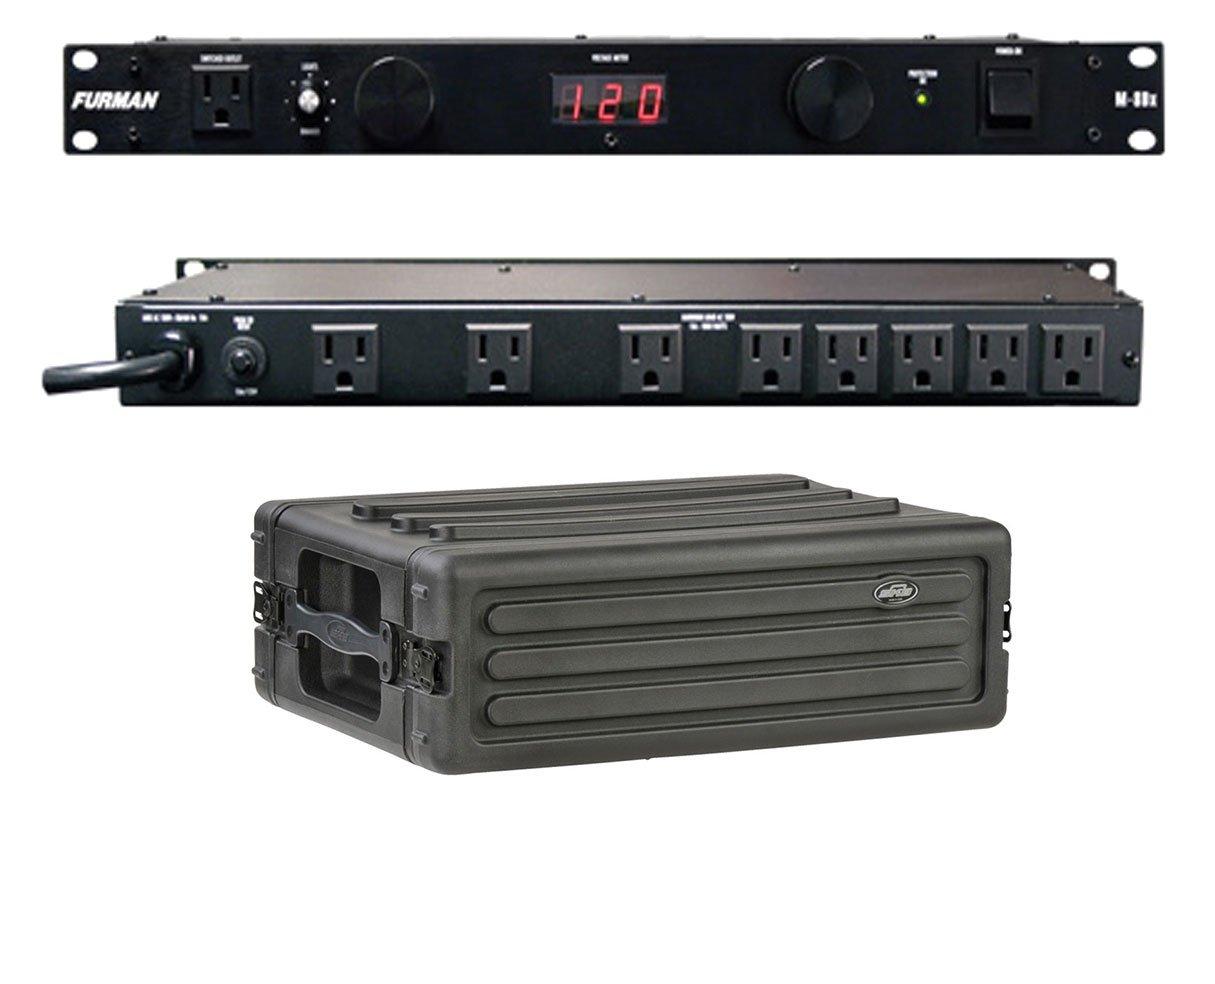 Furman M-8Dx 15 Amp Power Conditioner + SKB 1SKB-R3S 3U Shallow Rack